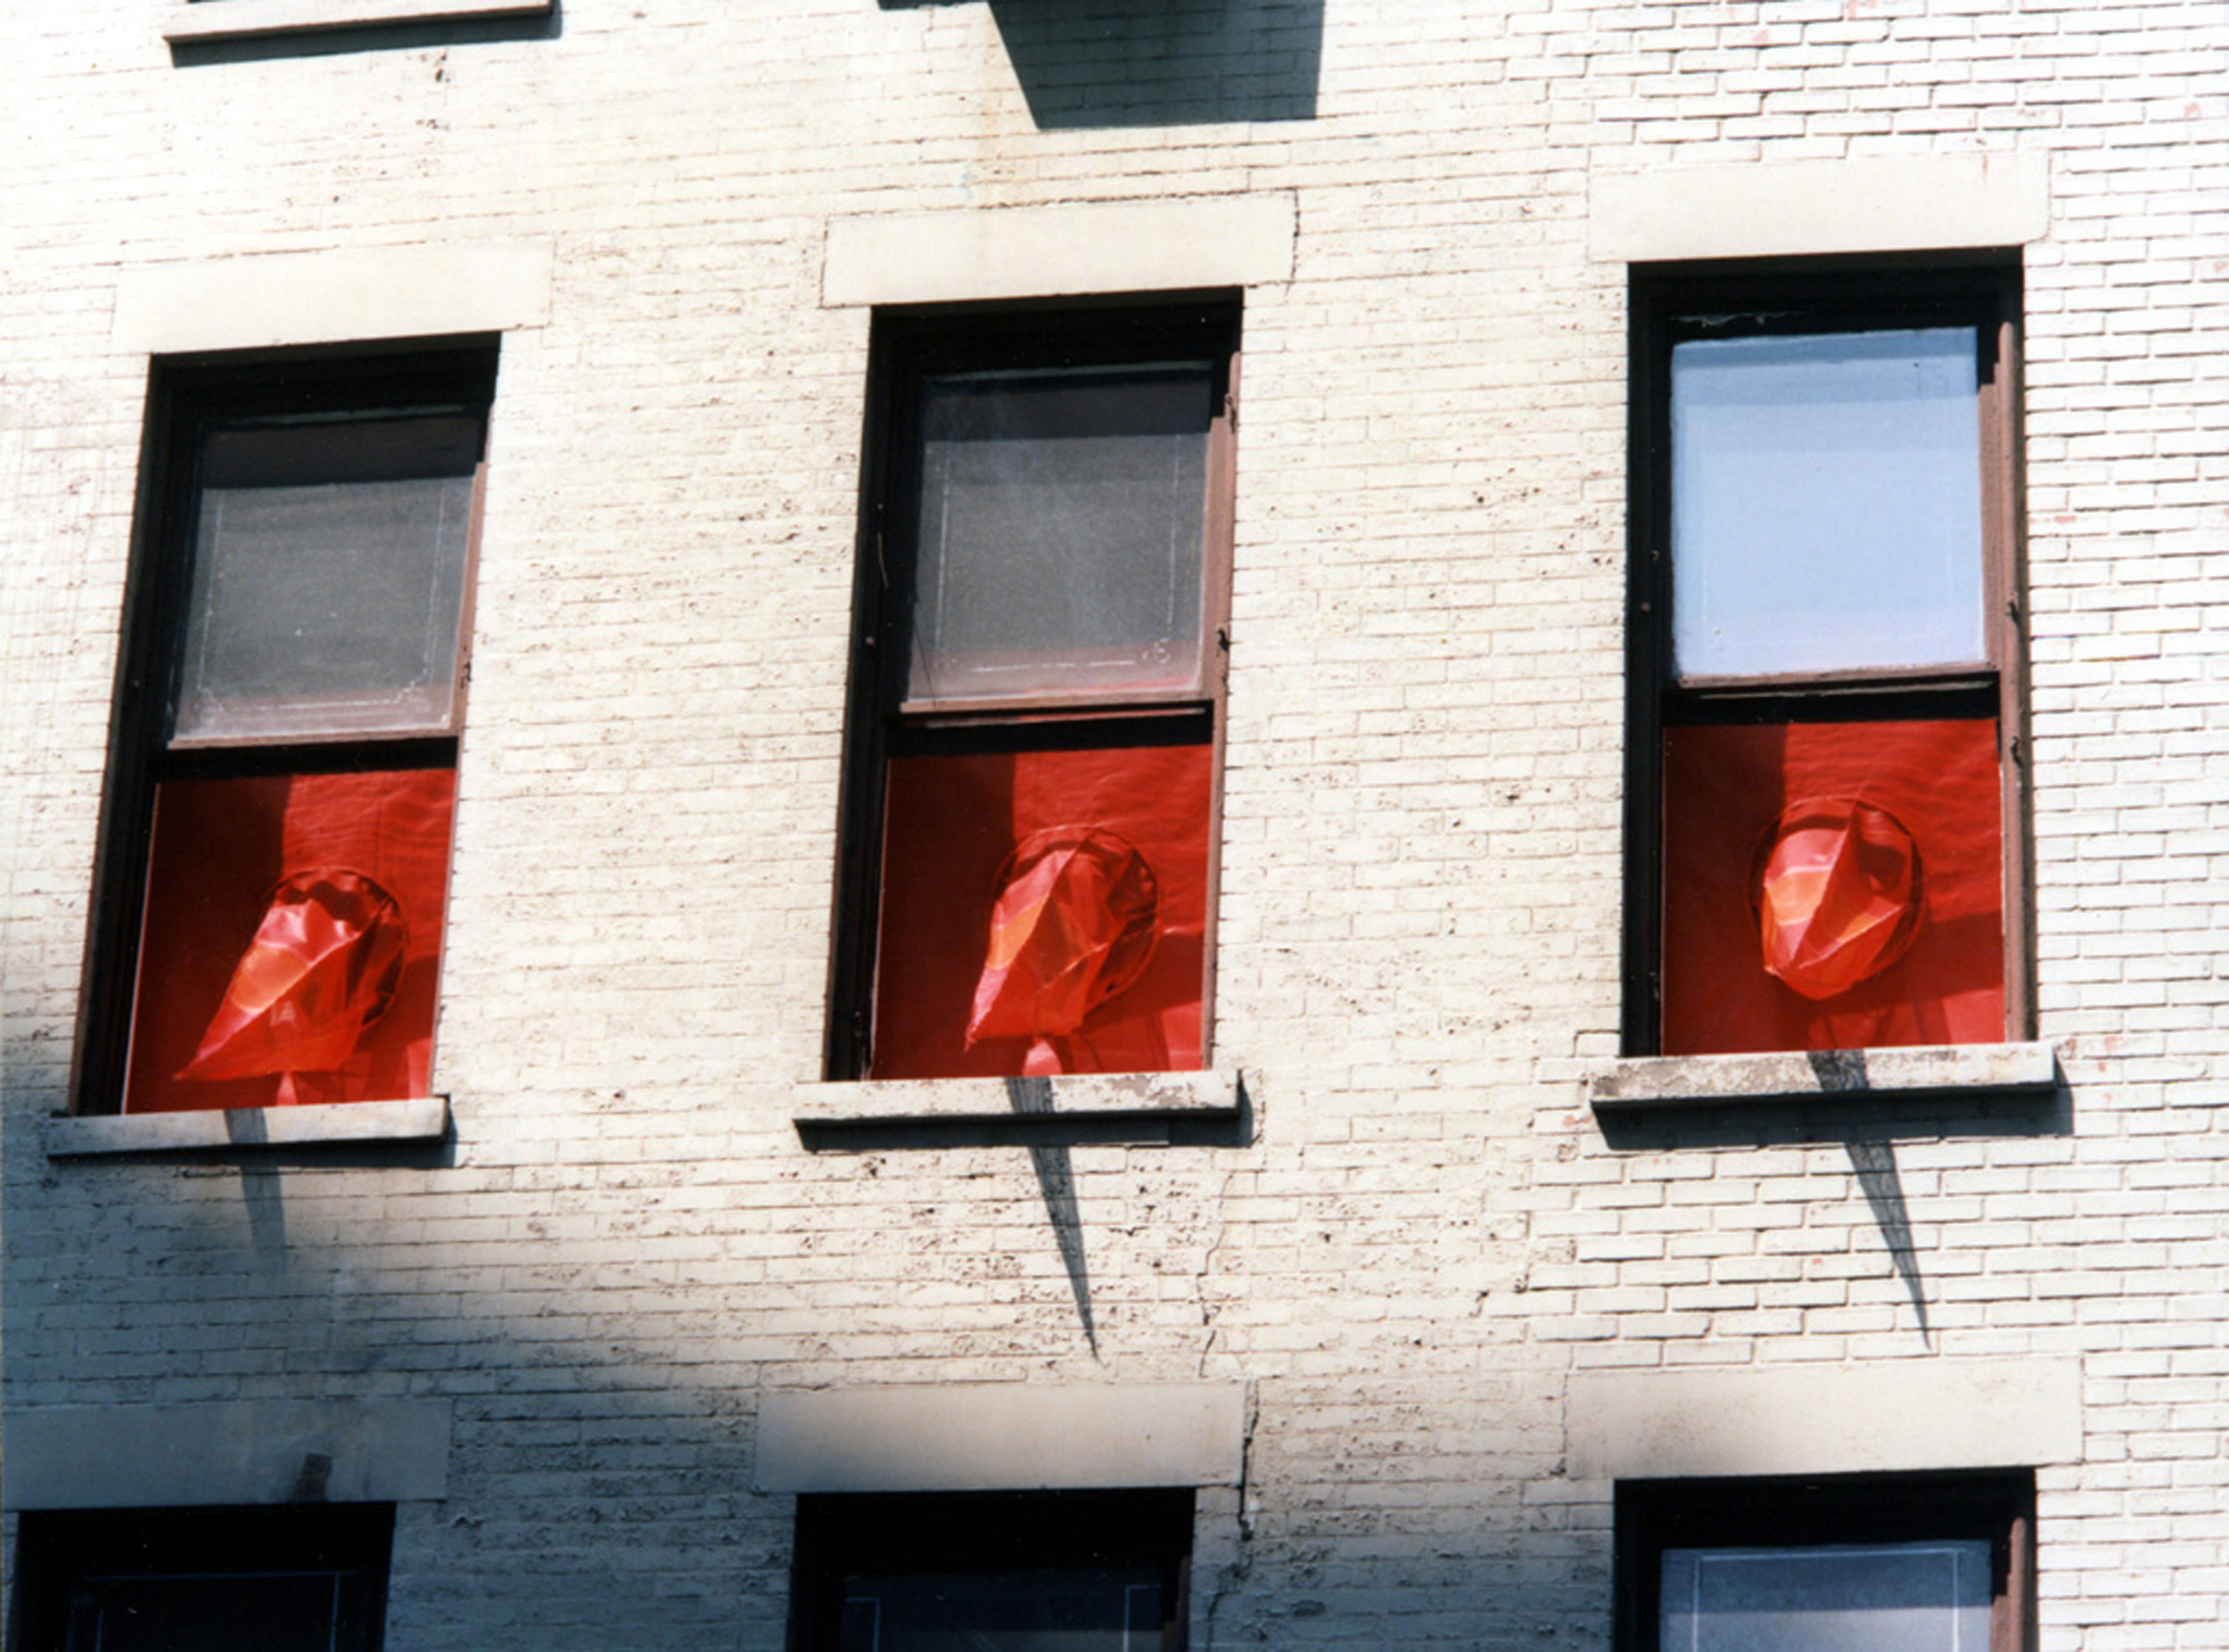 RED SPIKES ON 29TH STREET_Echelman_PhotoStudioEchelman_1.jpg